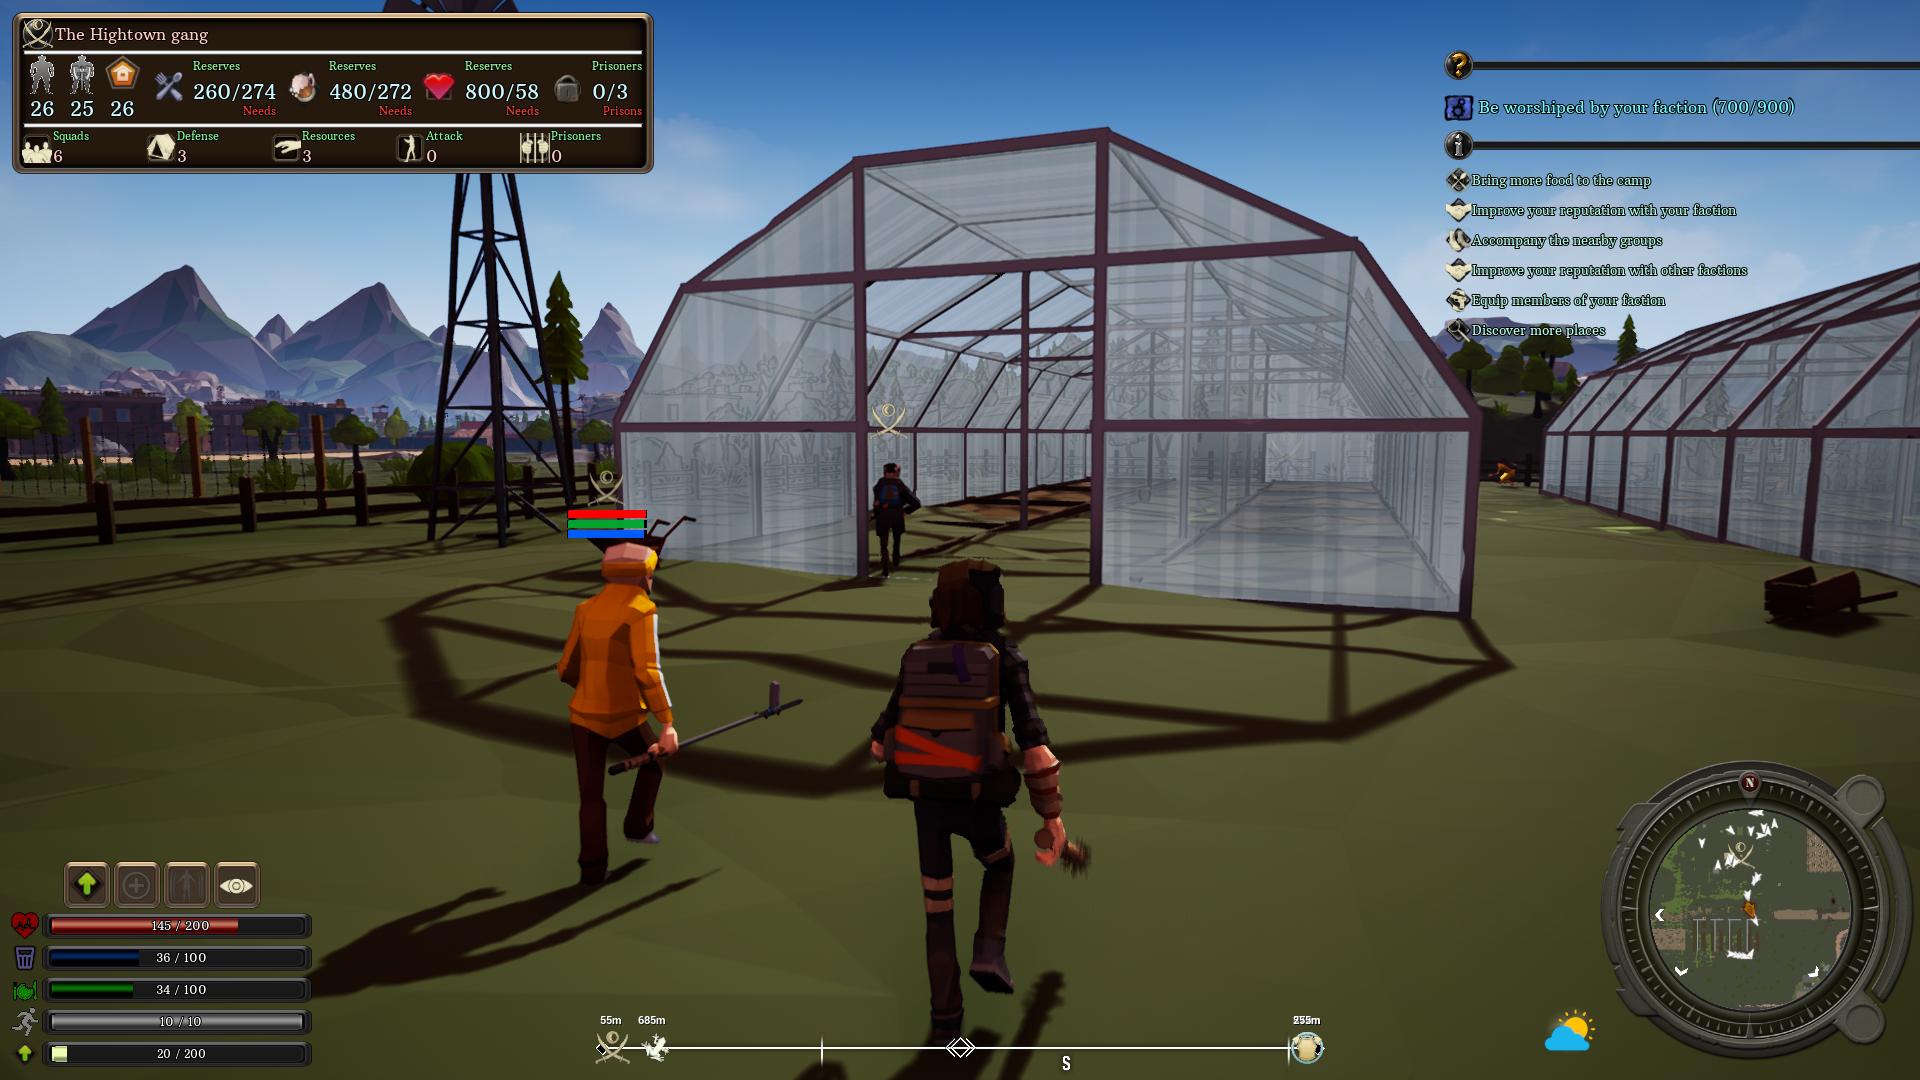 Heavenworld Screenshot 2020 04 1 1